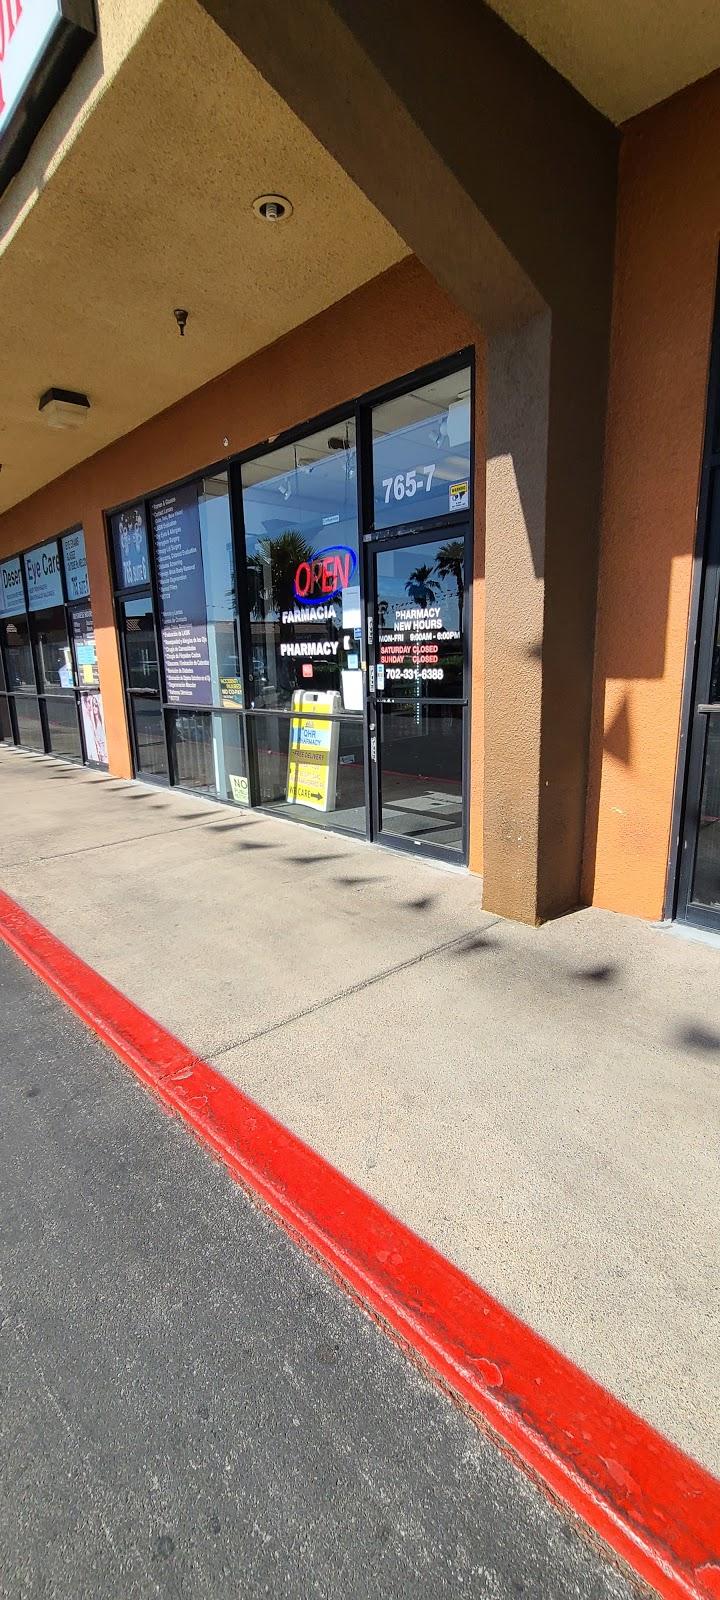 QHR Pharmacy - pharmacy    Photo 5 of 5   Address: 765 N Nellis Blvd #7, Las Vegas, NV 89110, USA   Phone: (702) 331-6388